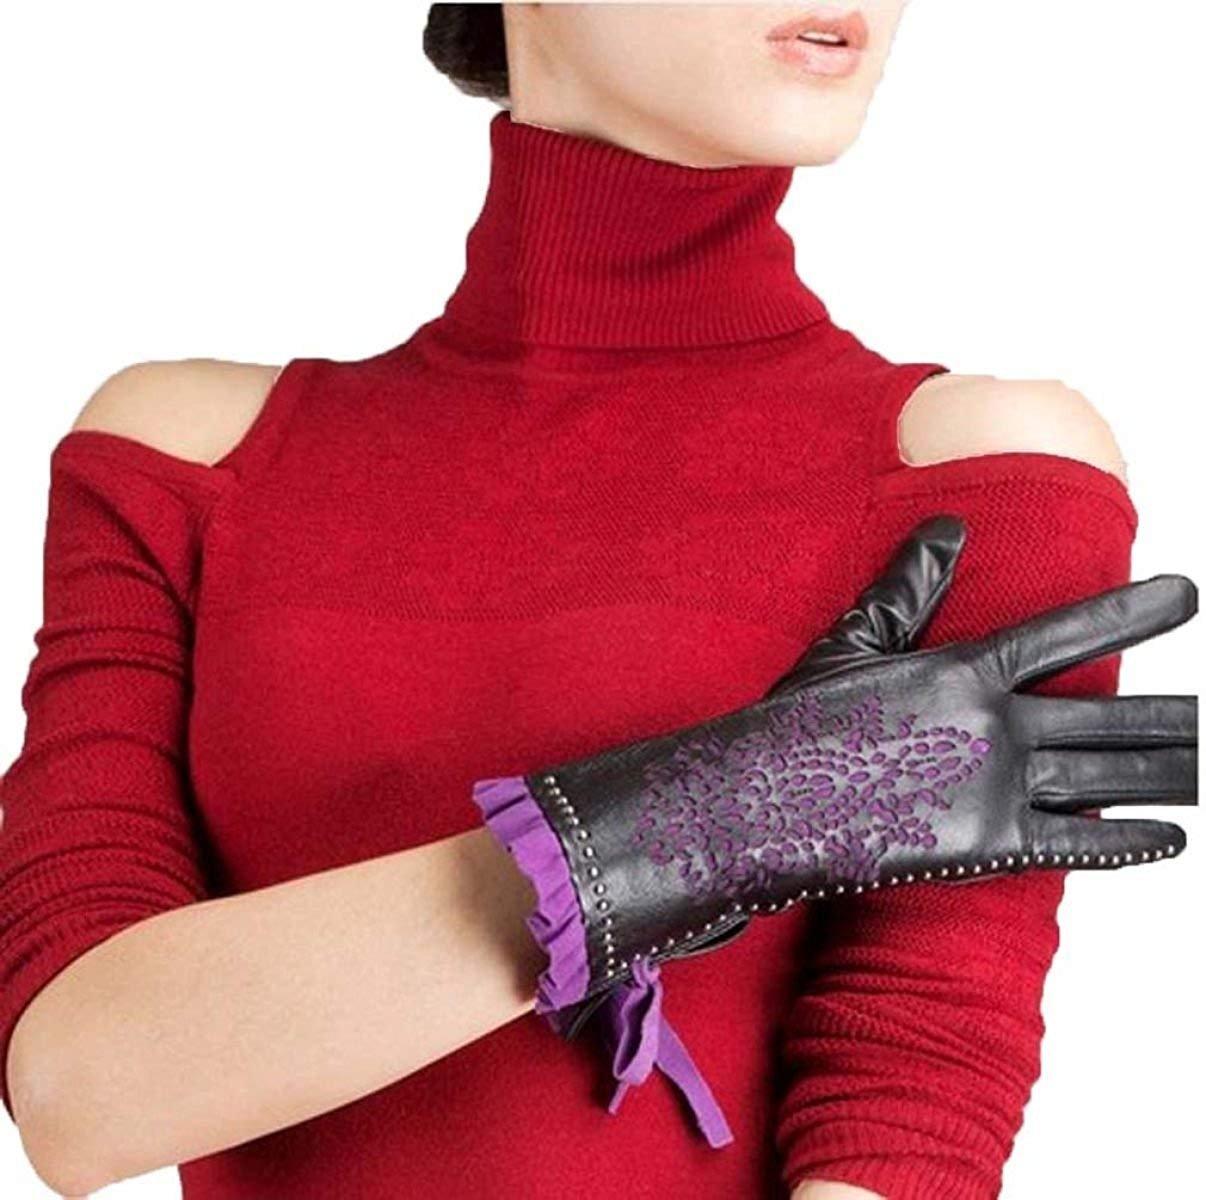 CWJ Women's Winter Warm Leather Gloves Short Classi Half Finger Super Warm Purple,Purple,Large